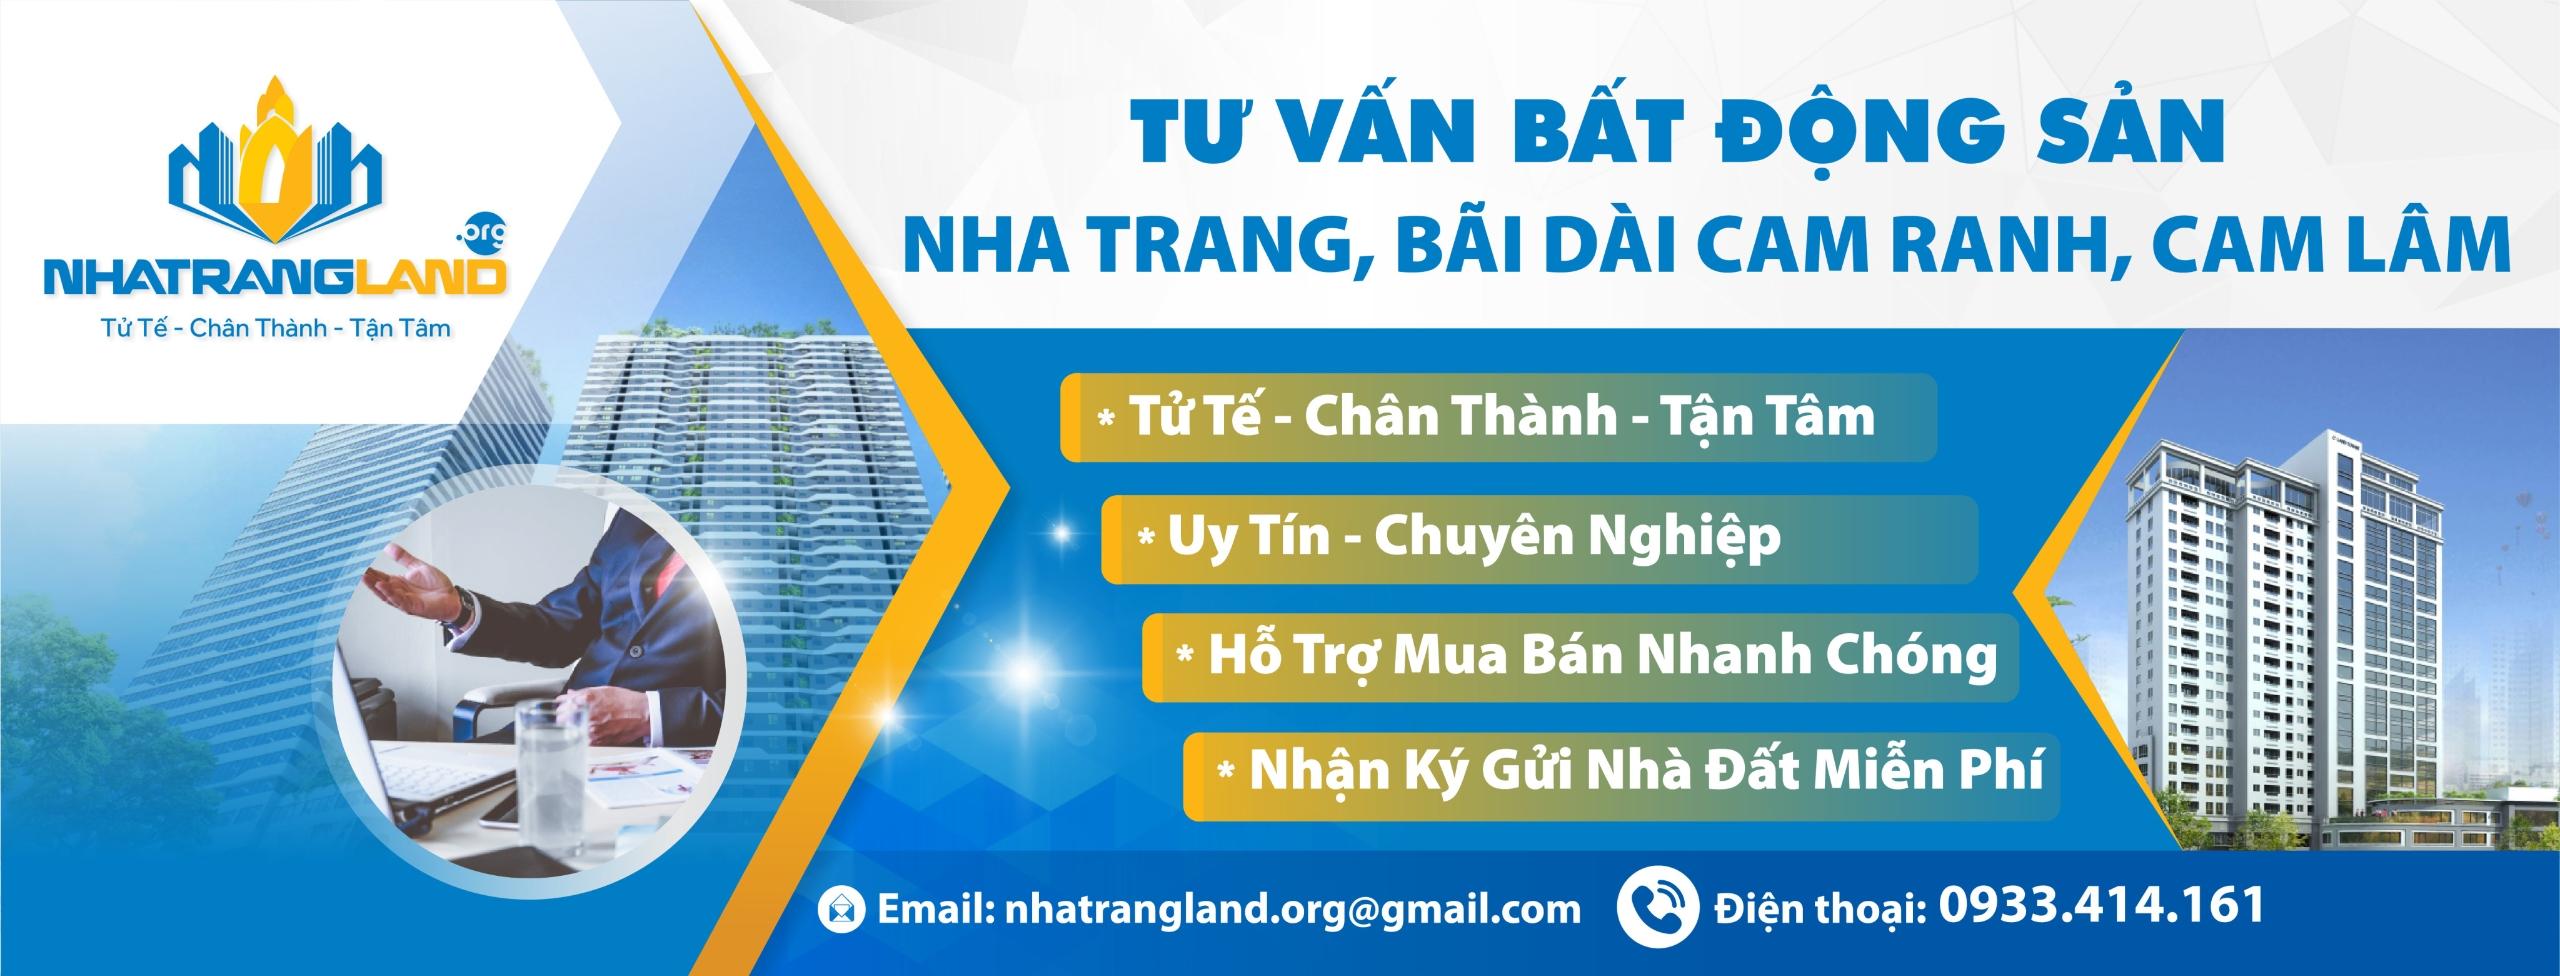 Nha Trang Land (@nhatrangland) Cover Image